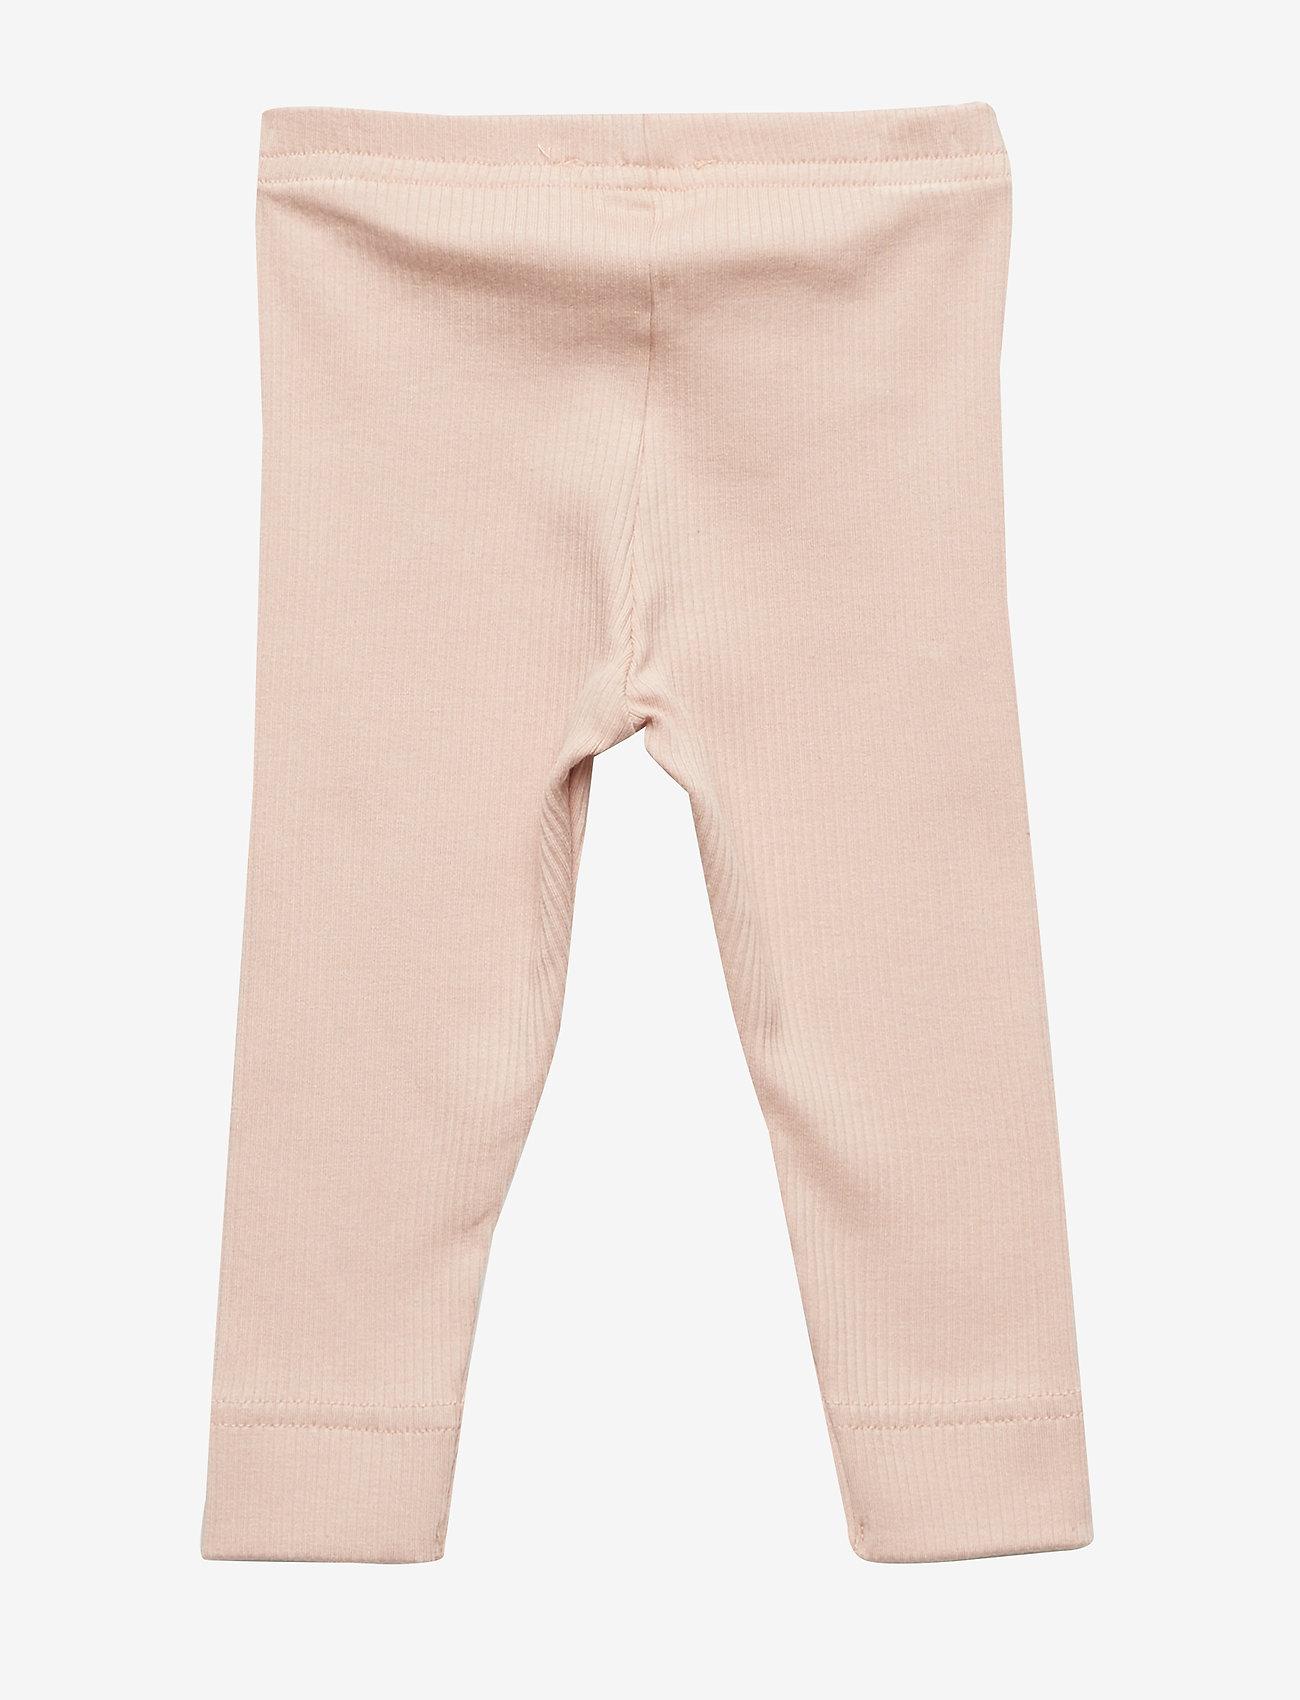 MarMar Cph - Leg - leggings - rose - 1